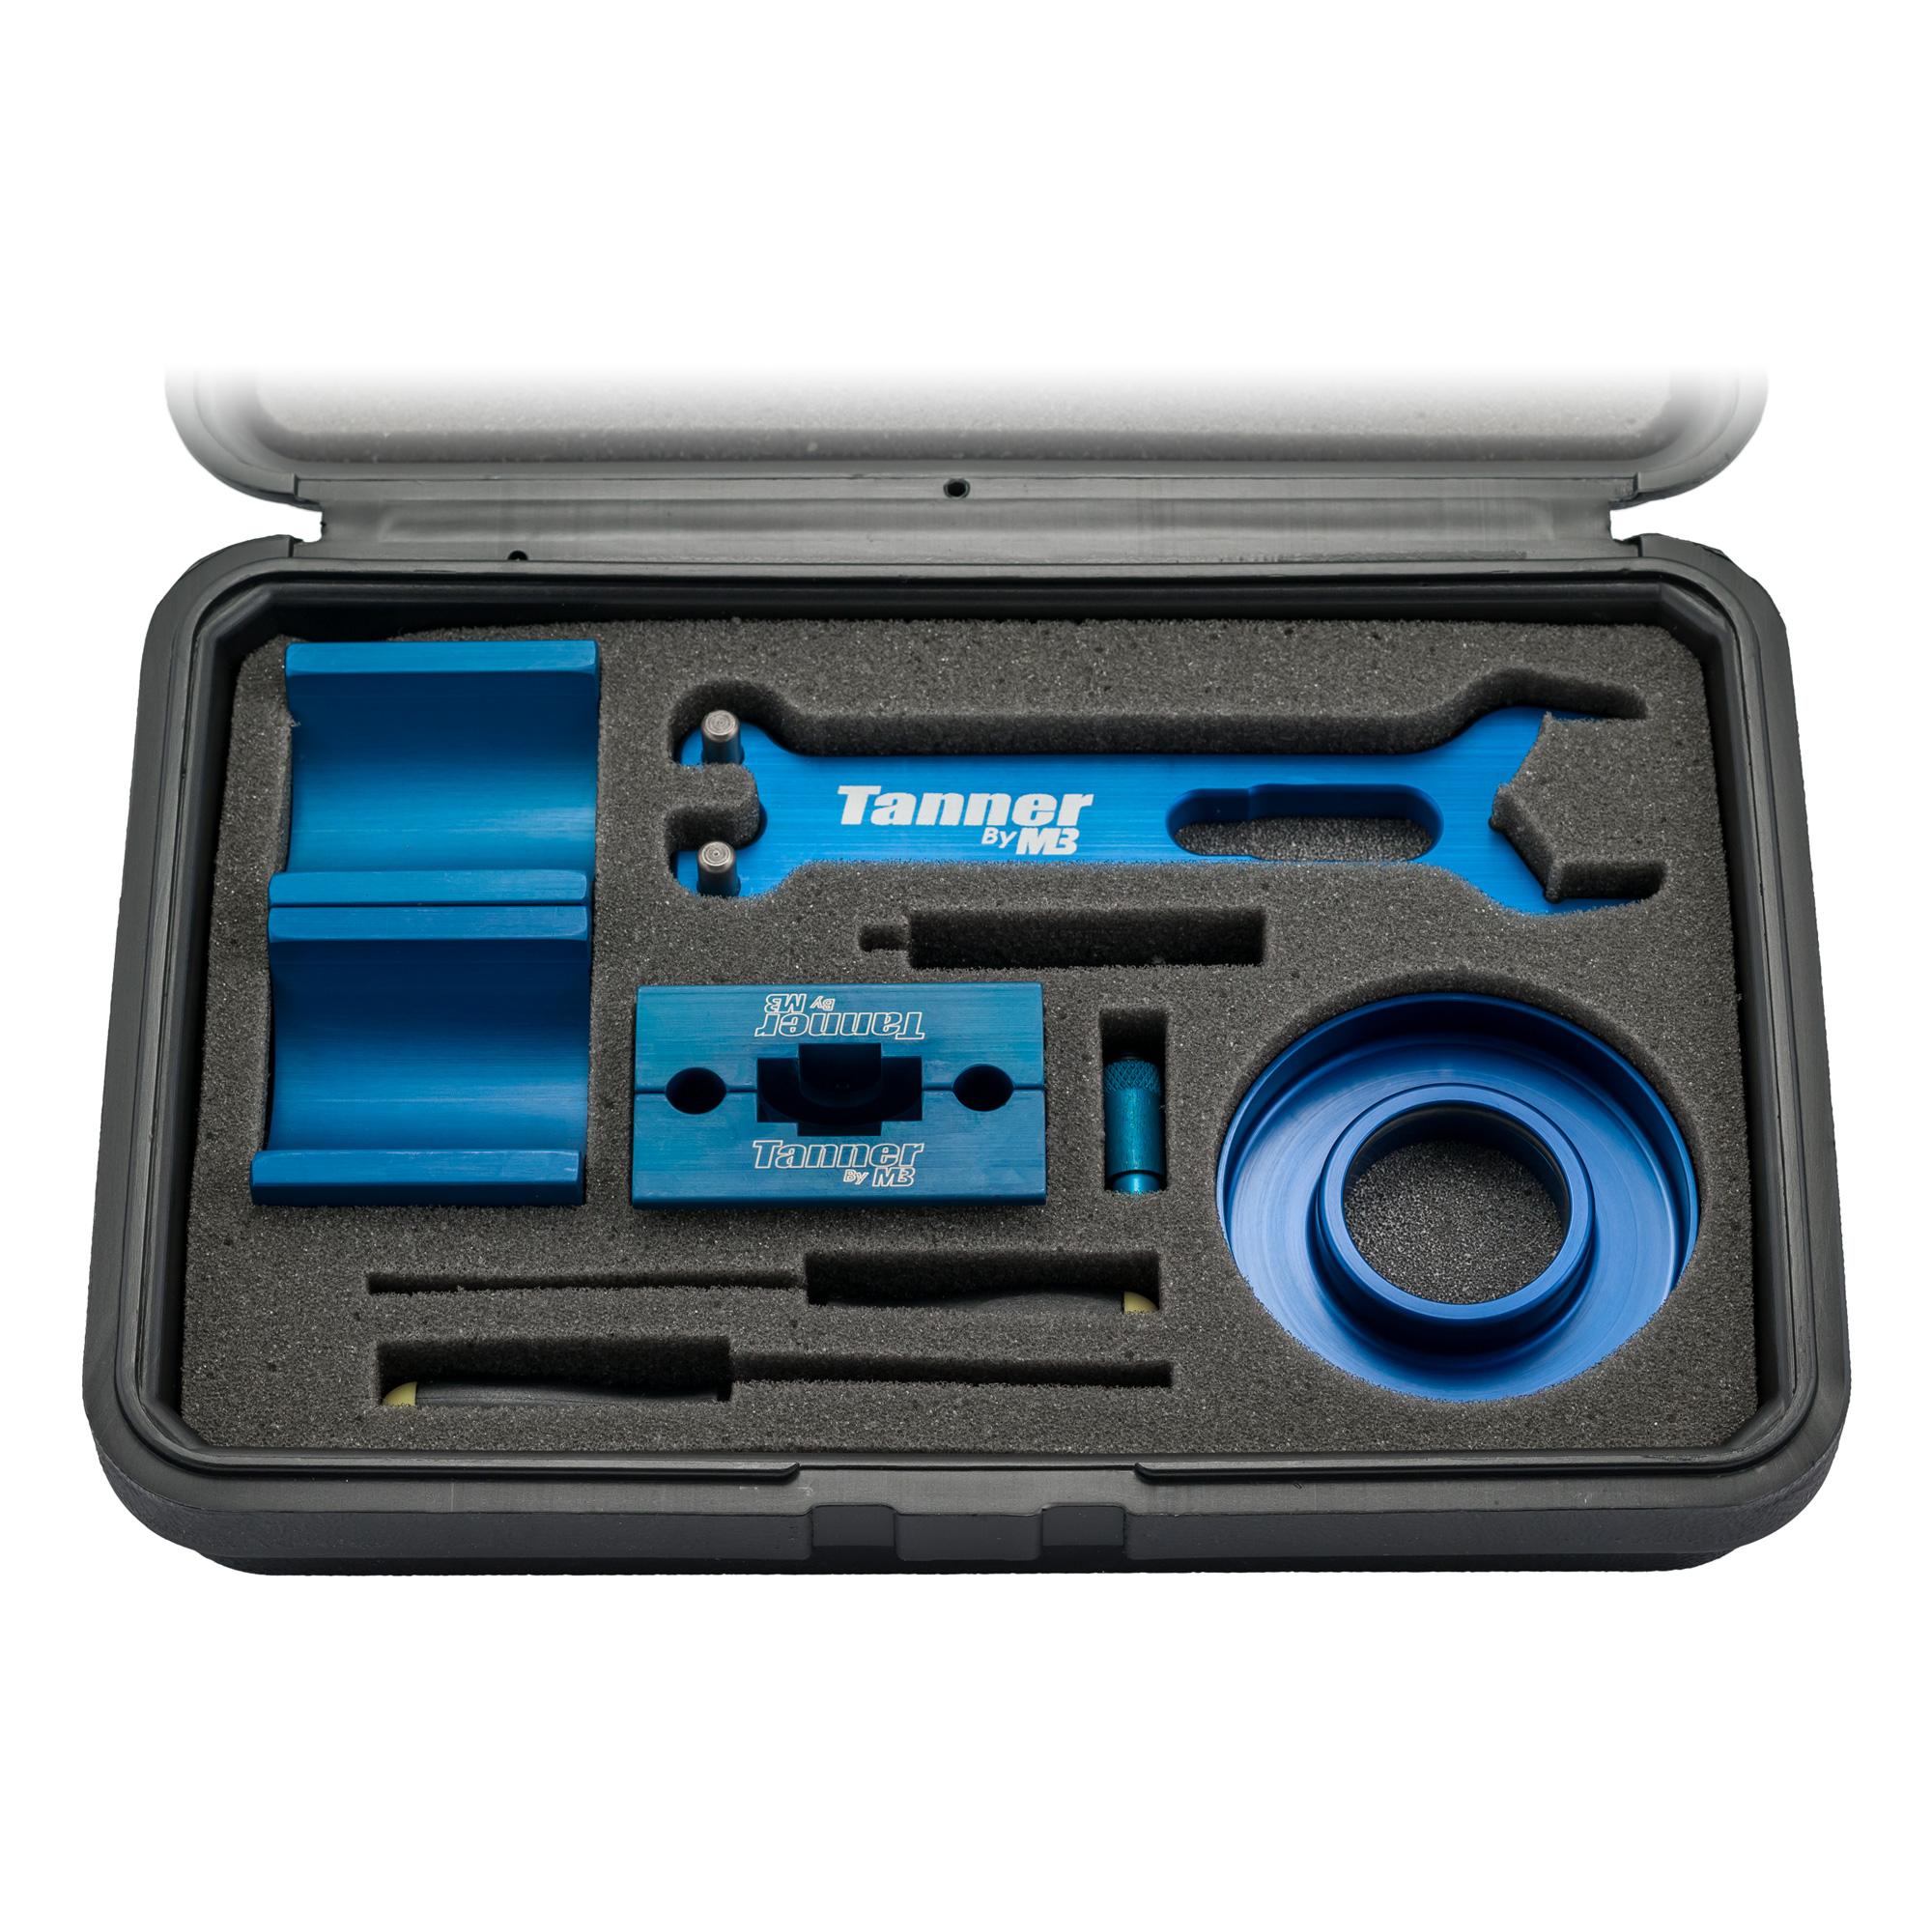 Shock Rebuilding Tools & Kits